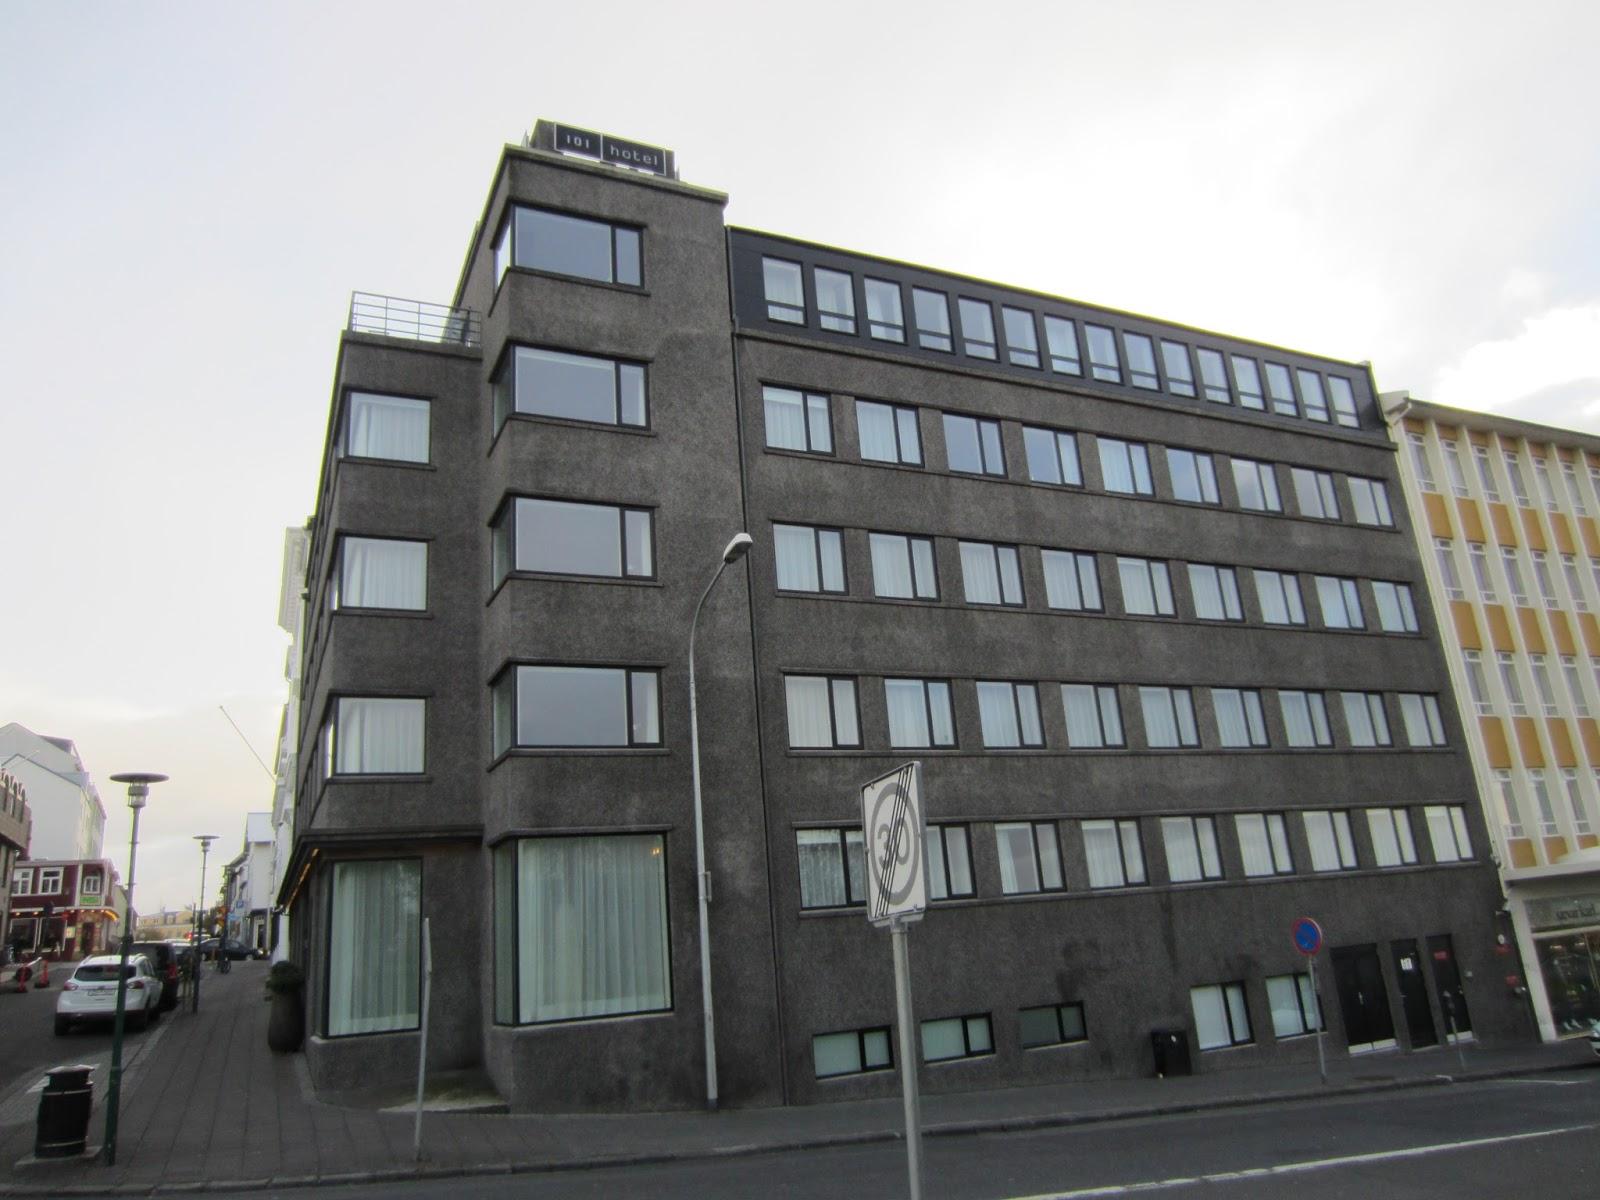 101 Hotel Reykjavik  Henriktravelm. Quality  Continental Brescia. Abi D'Oru Hotel. Mayhills Resort. Hotel Bavaria. Hotel Viva Villahermosa. Brighton Lodge. Vincci Estrella Del Mar Hotel. Alpen House Hotel